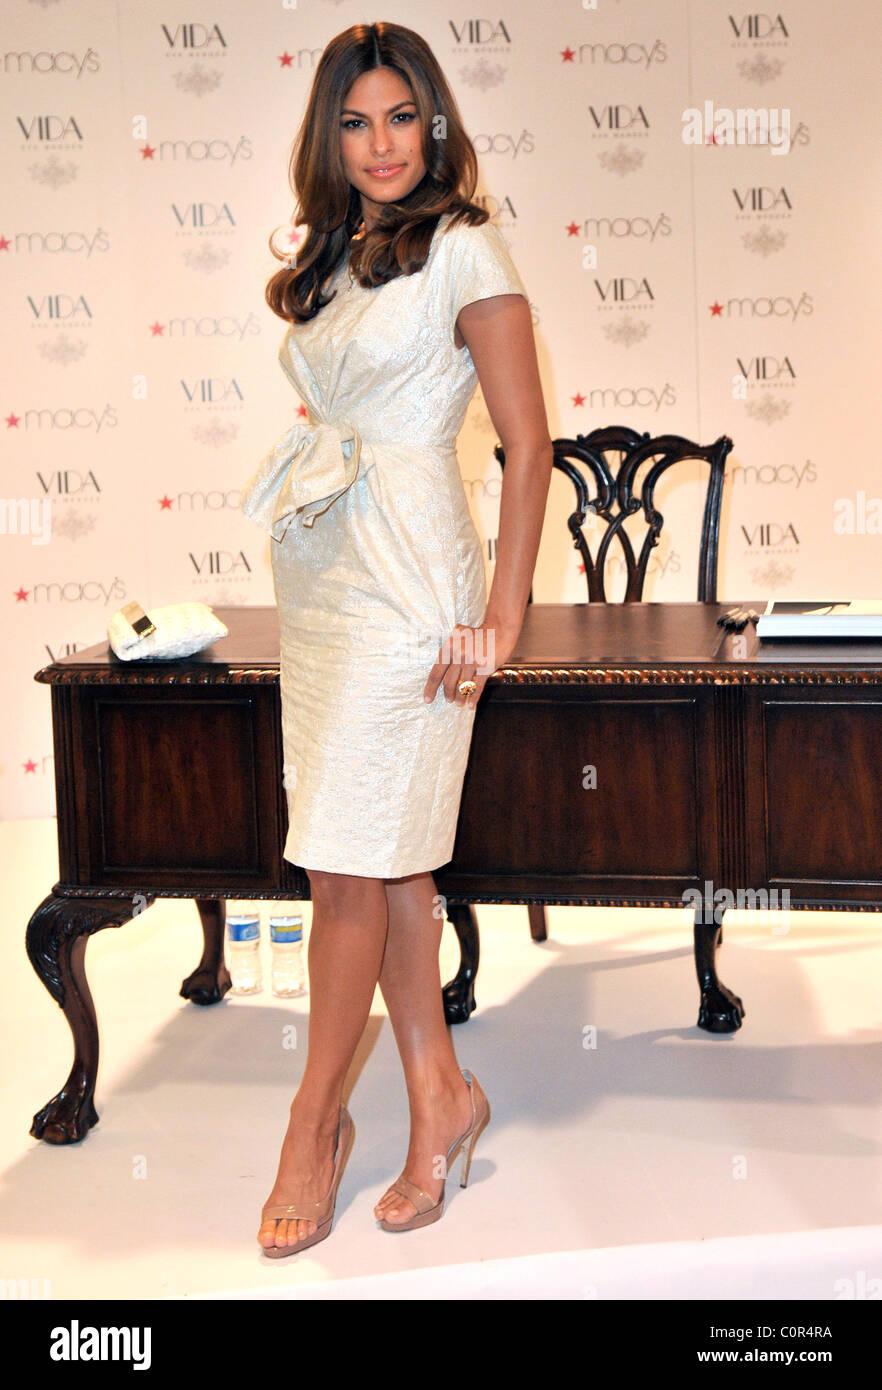 Actress Eva Mendes Launches Her New Home Decor Line Vida At Macy S Miami Florida 20 09 08